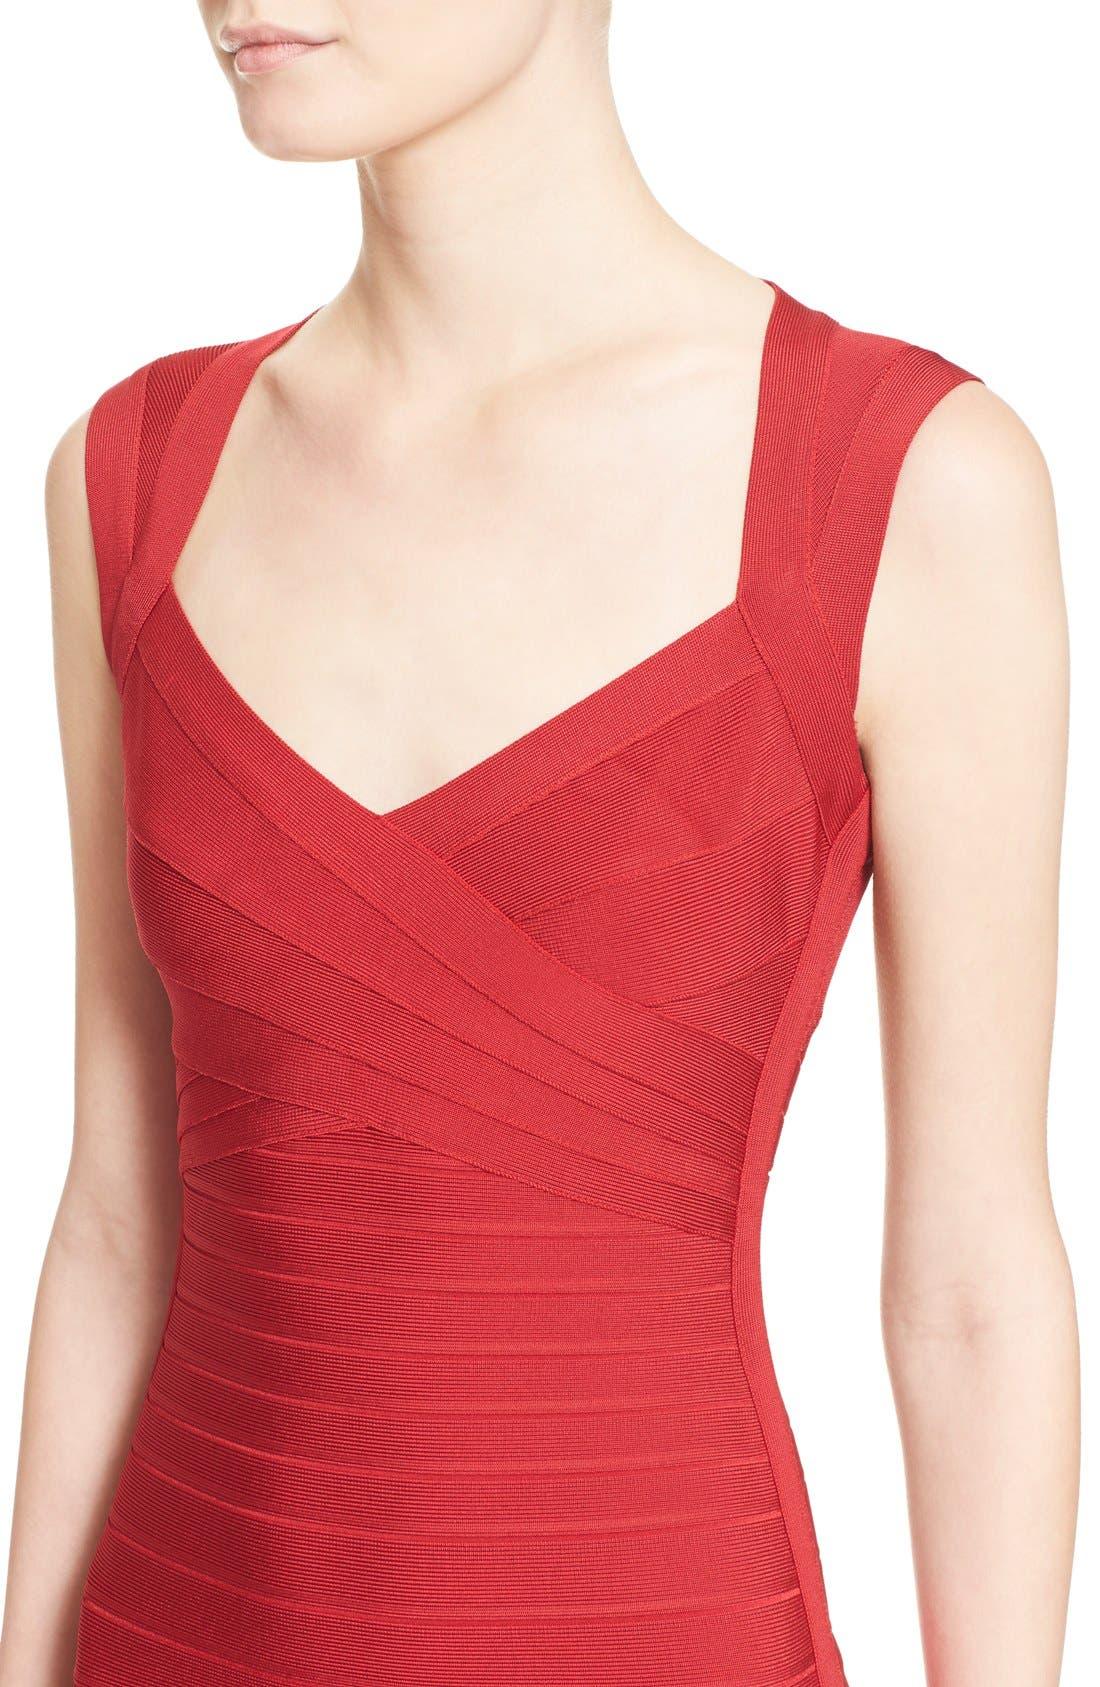 HERVE LEGER,                             Open Back Bandage Dress,                             Alternate thumbnail 6, color,                             616